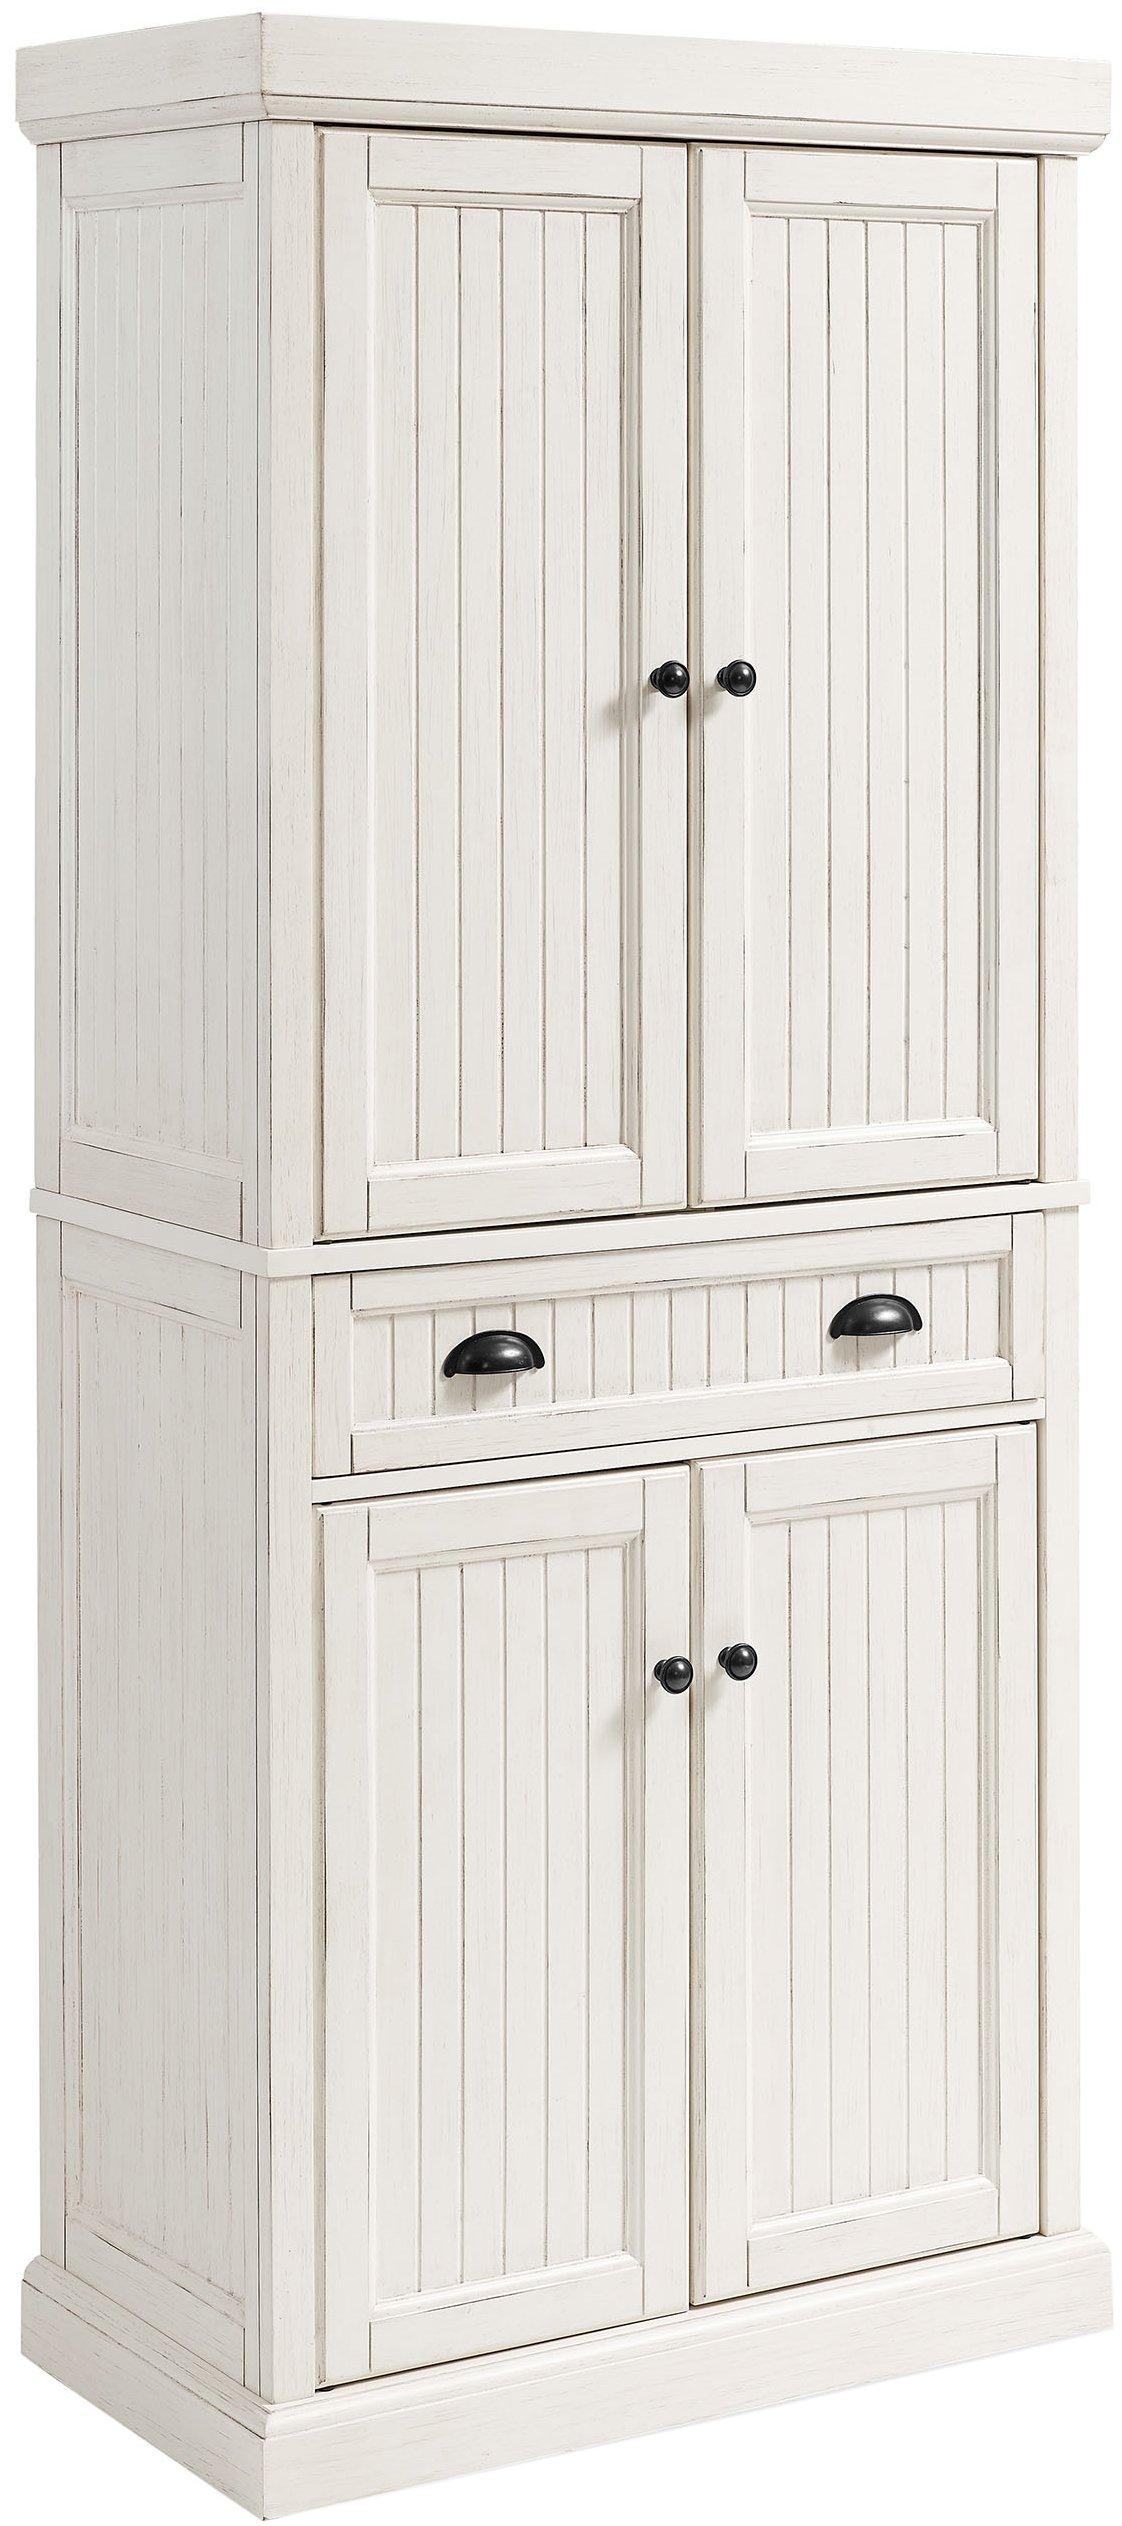 Crosley Furniture Seaside Kitchen Pantry Cabinet - Distressed White